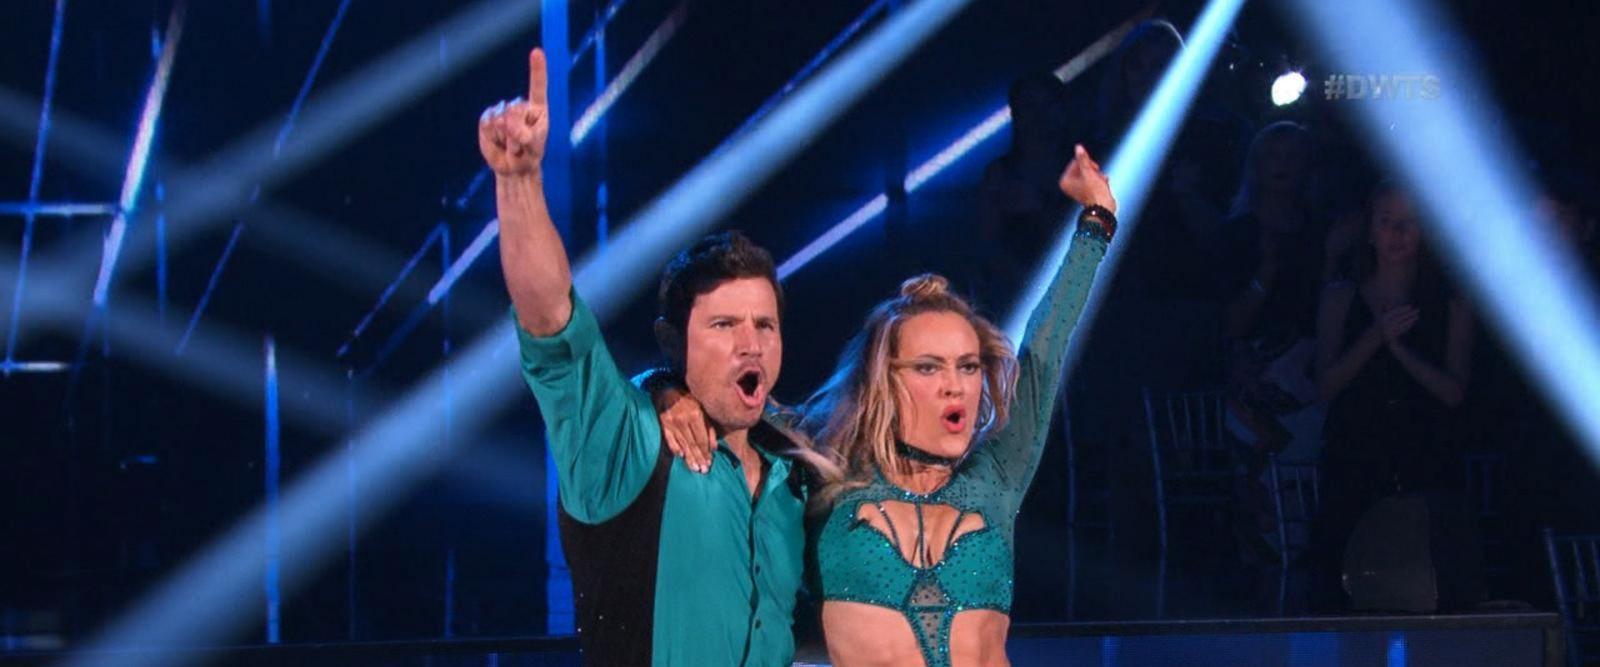 VIDEO: 'Dancing With the Stars' season premiere recap